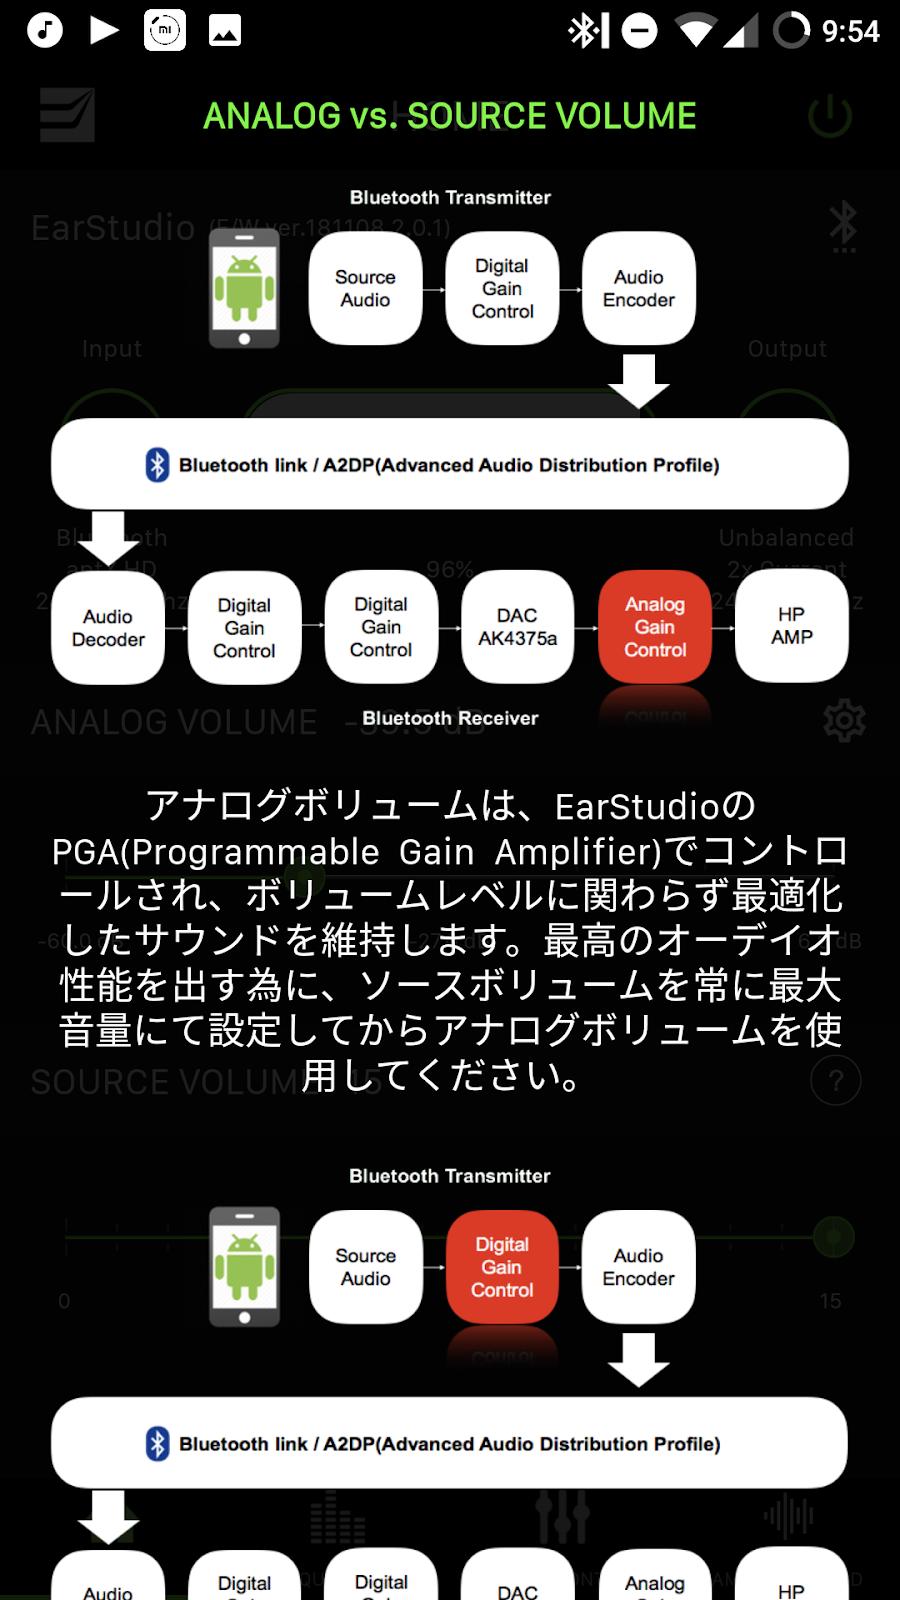 earstudio ファームウェア